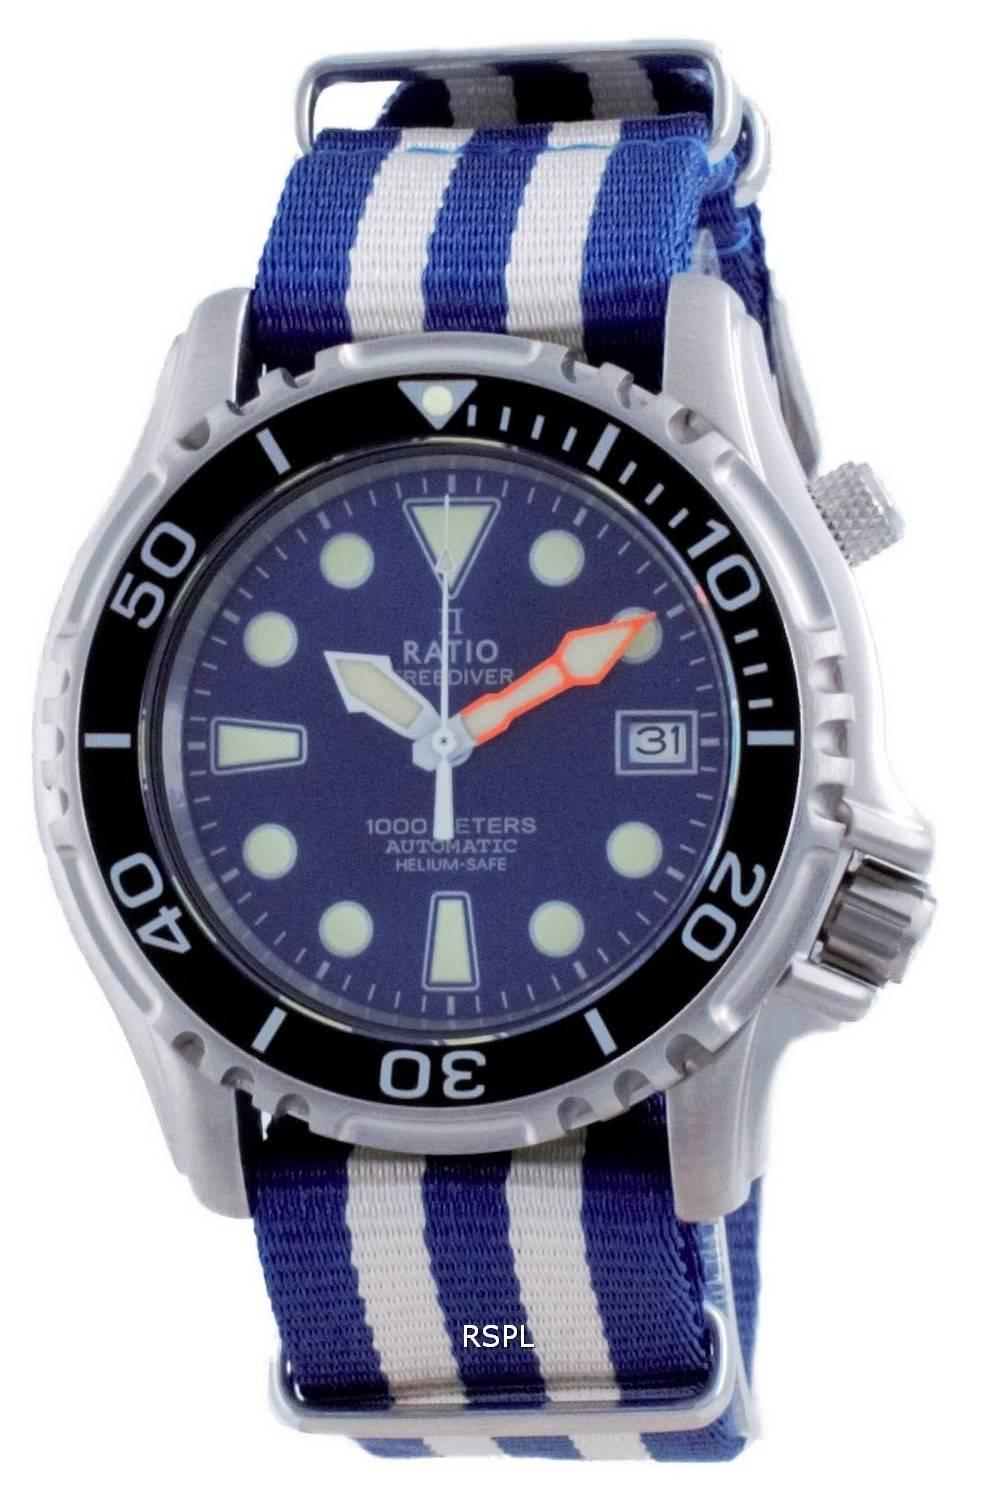 Suhde vapaa Diver Helium Safe Nylon Automatic Diver&#39,s 1066KE20-33VA-BLU-var-NATO2 1000M miesten kello